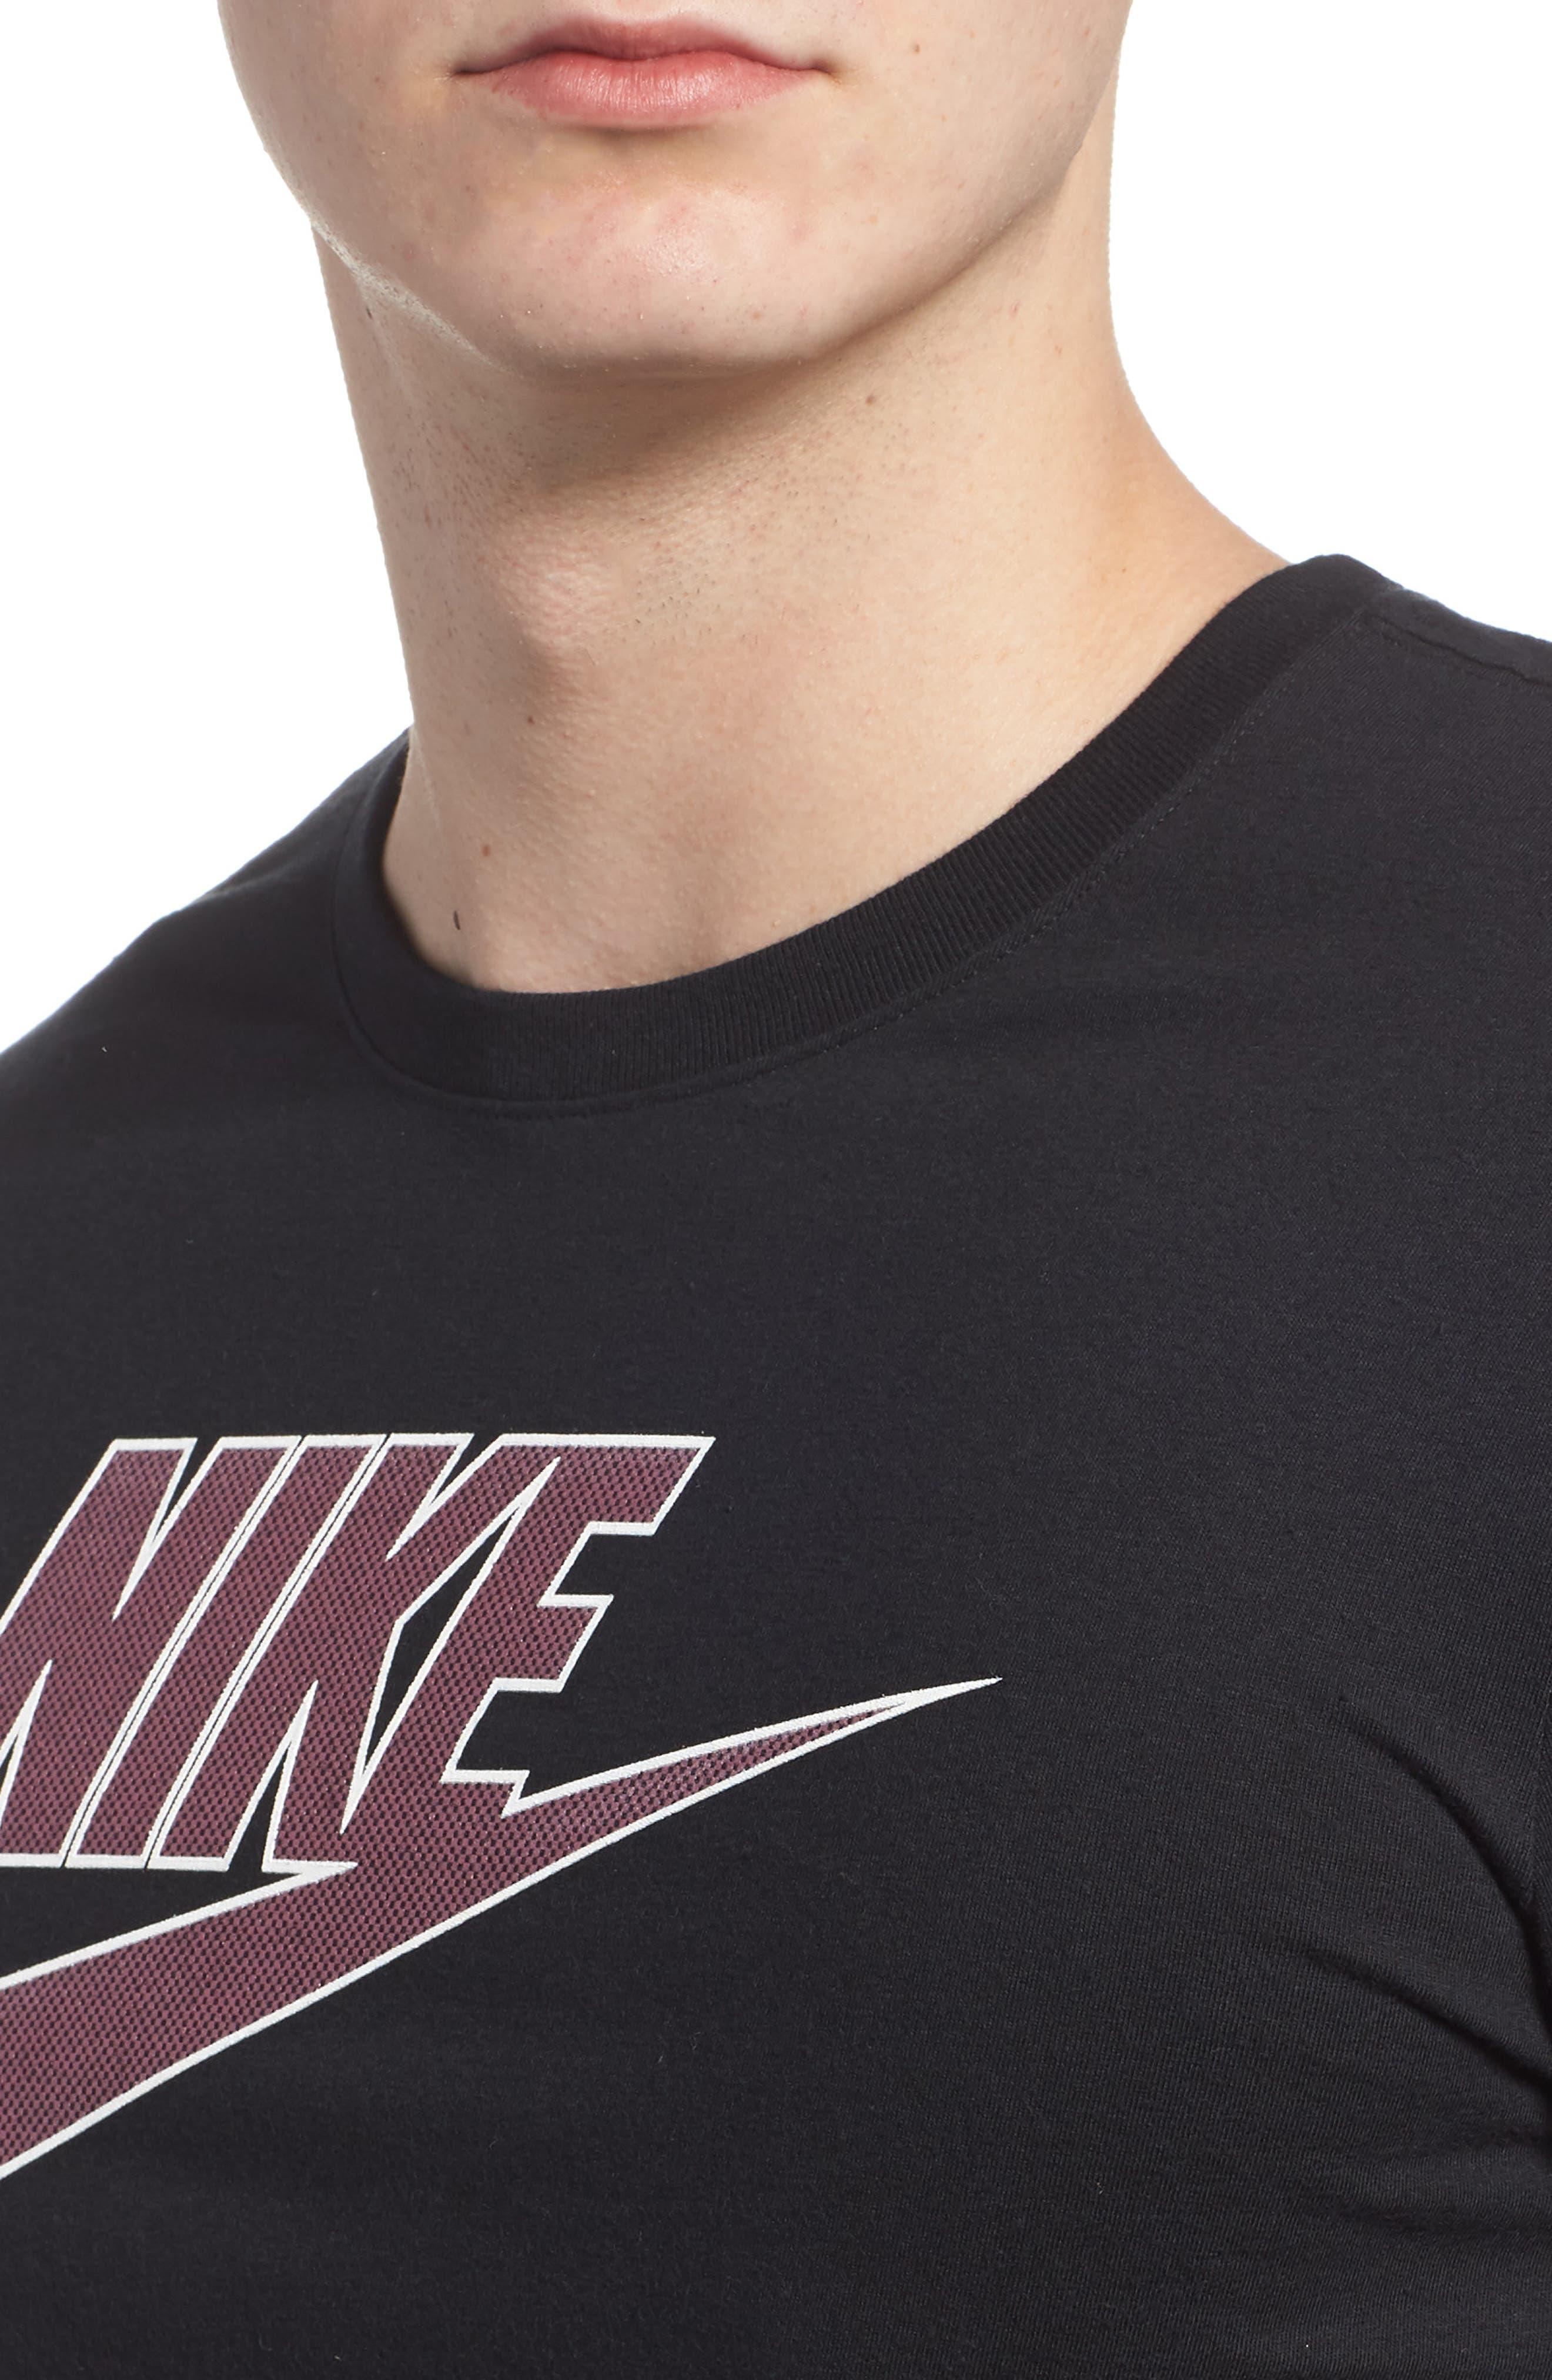 Sportswear Futura Logo Graphic T-Shirt,                             Alternate thumbnail 4, color,                             Black/ Vintage Wine